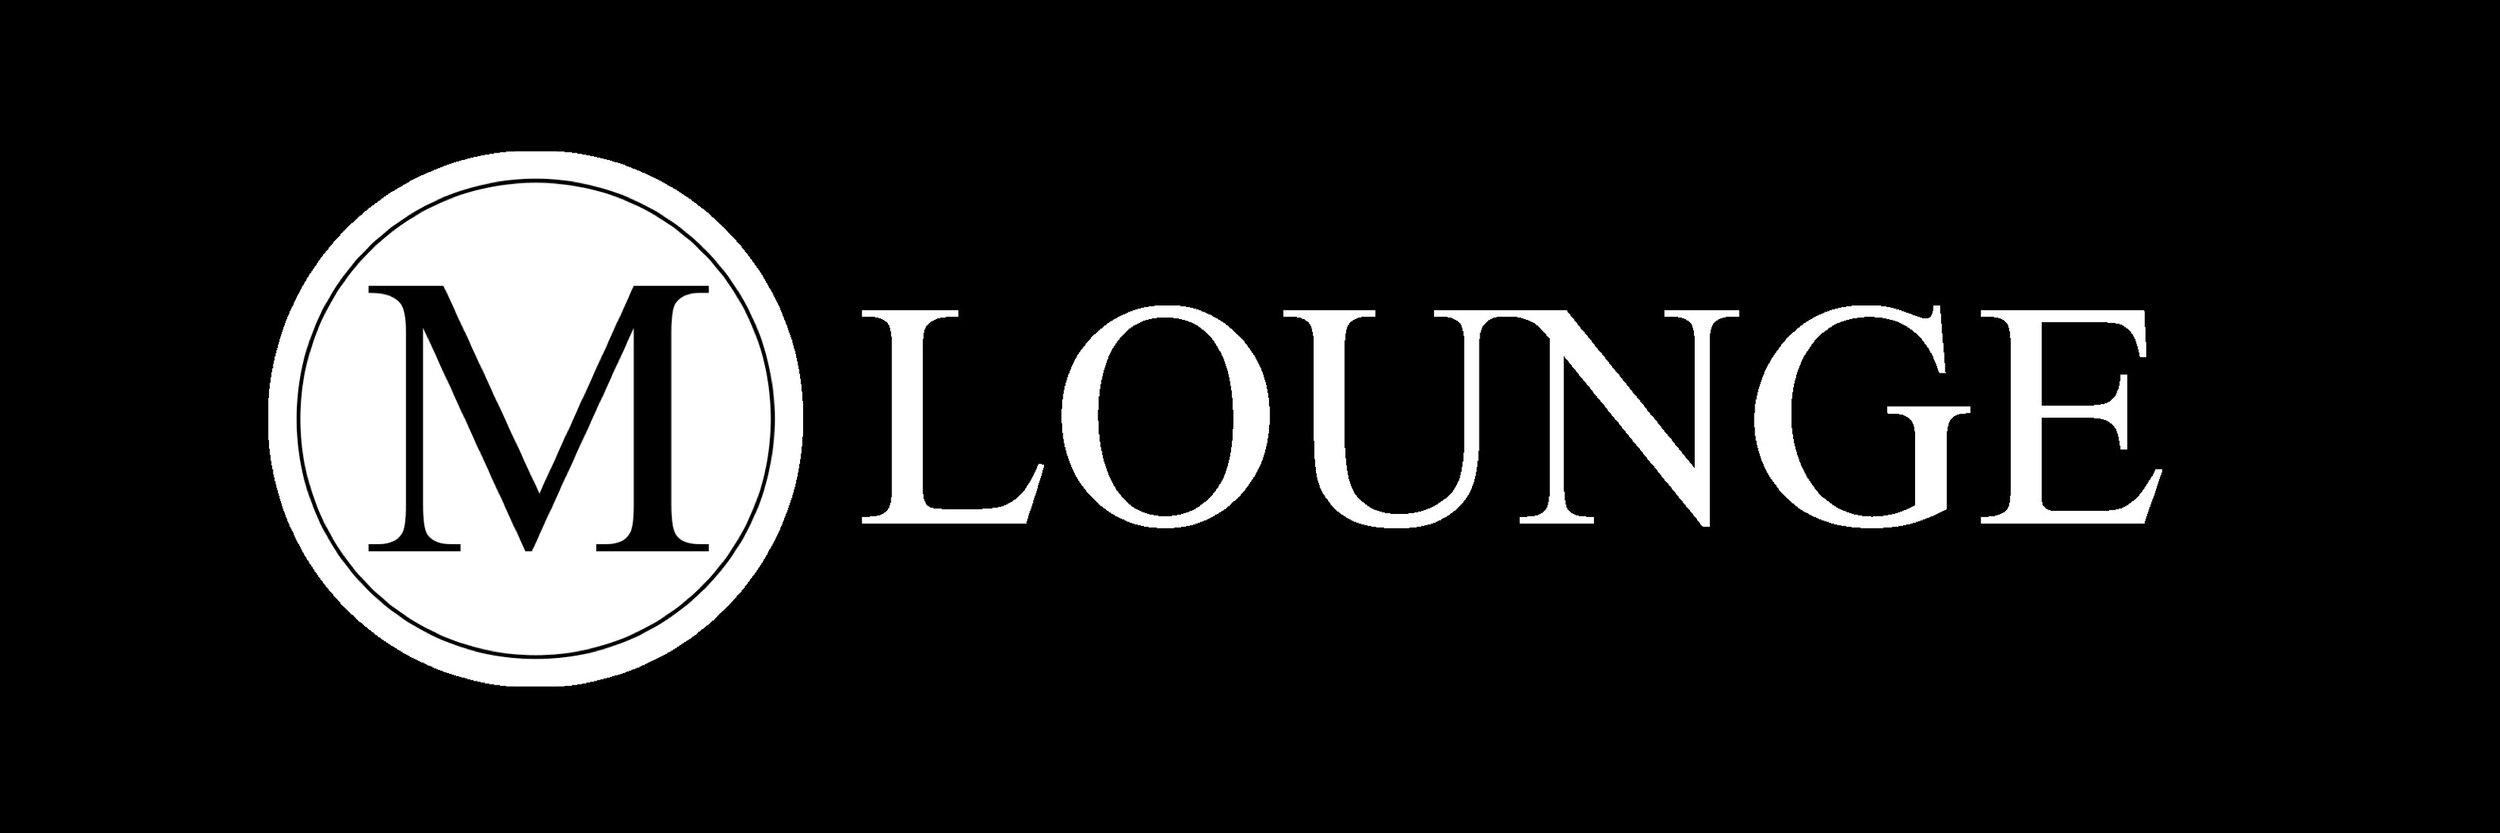 M Lounge Orlando Stratus Roofing client.jpg